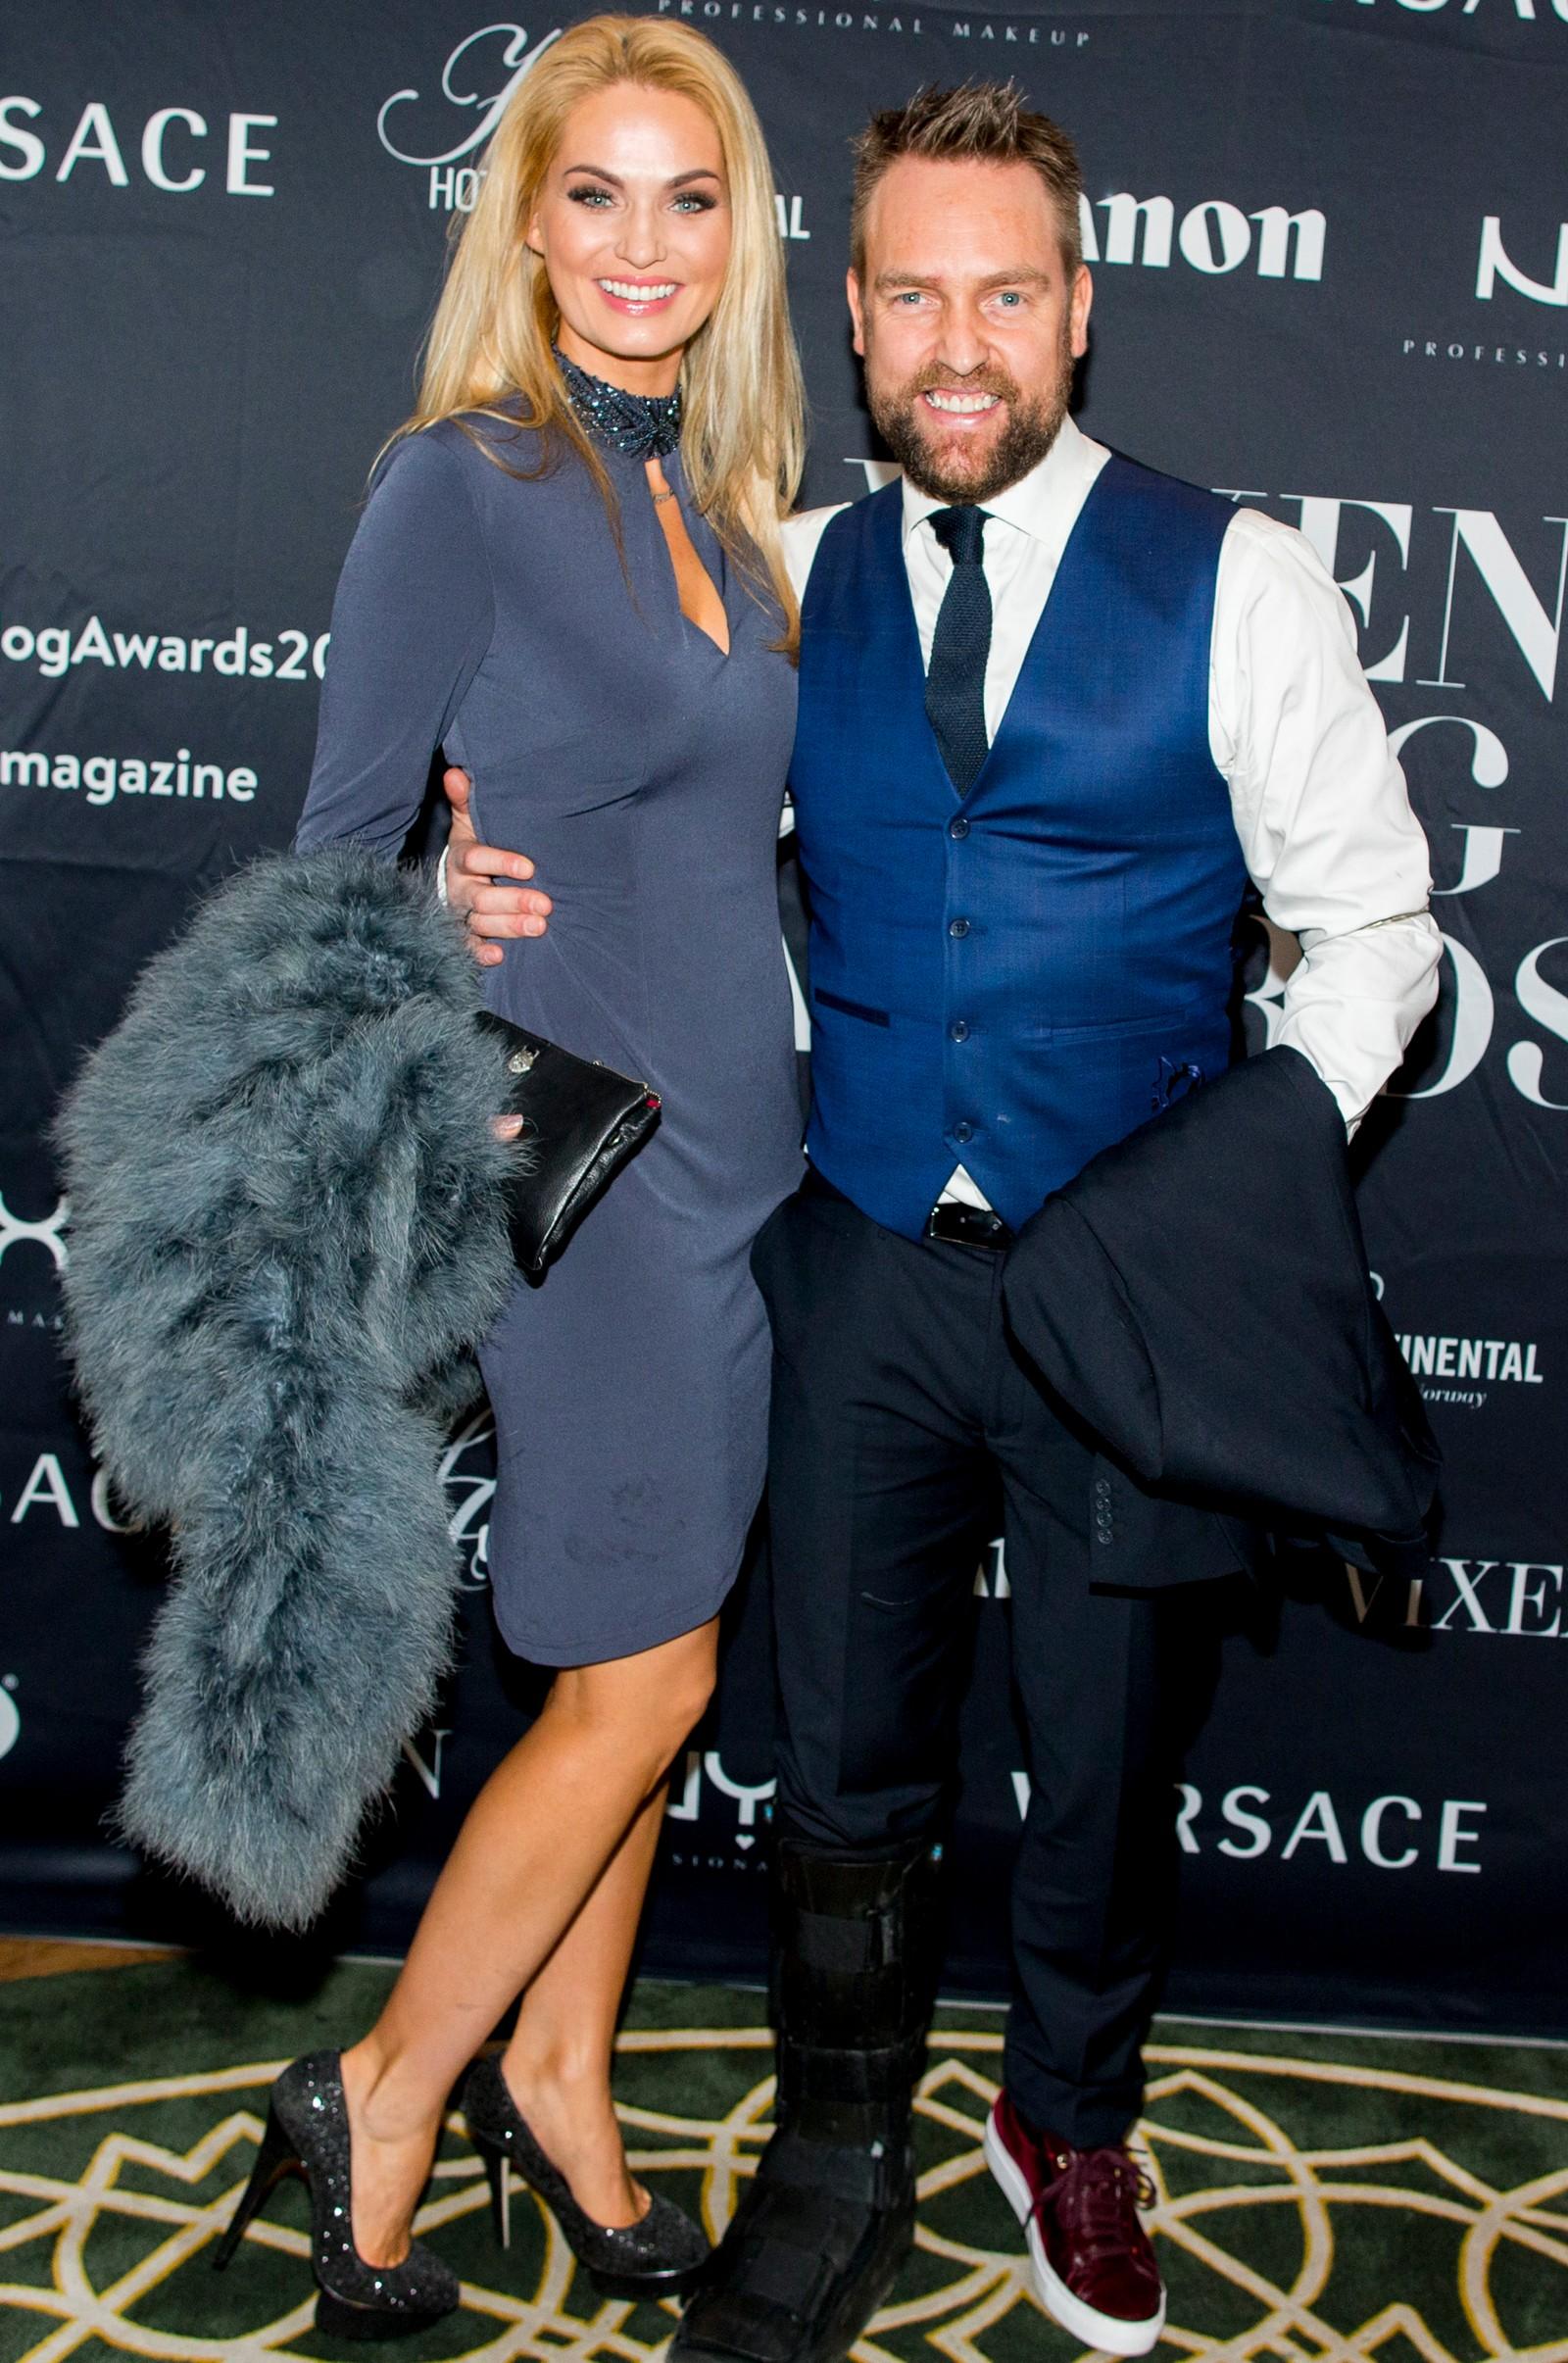 Marna Haugen Burøe (Komikerfrue) og Ørjan Burøe ankommer Vixen Blog Awards 2015 på Hotel Continental i Oslo fredag kveld.